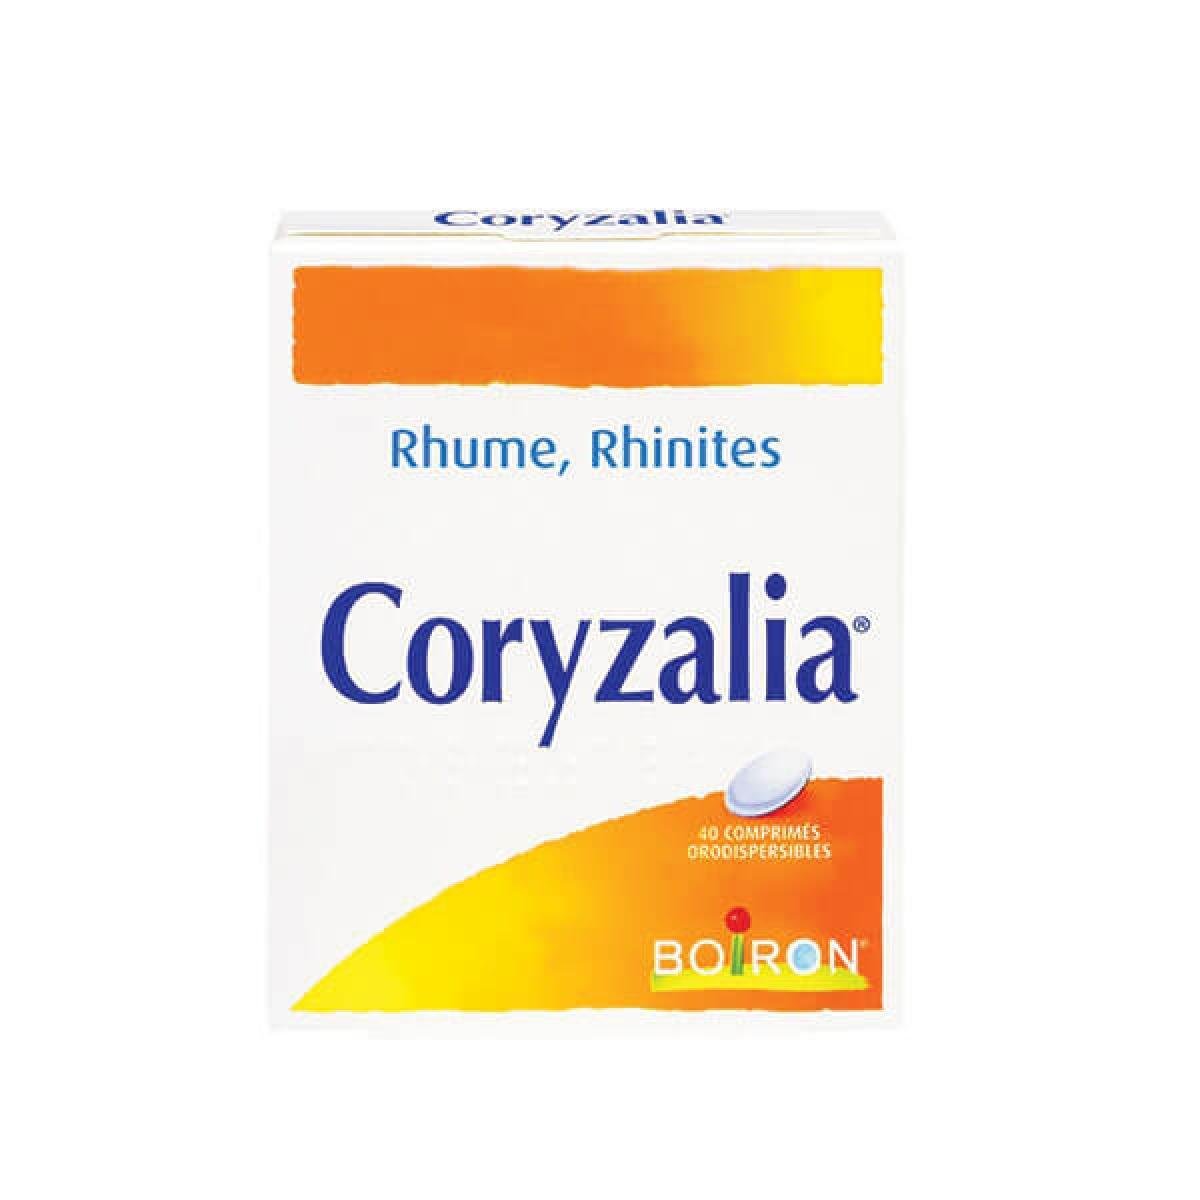 coryzalia 40 comprim s orodispersibles dans rhume nez bouch sur pharmarket. Black Bedroom Furniture Sets. Home Design Ideas